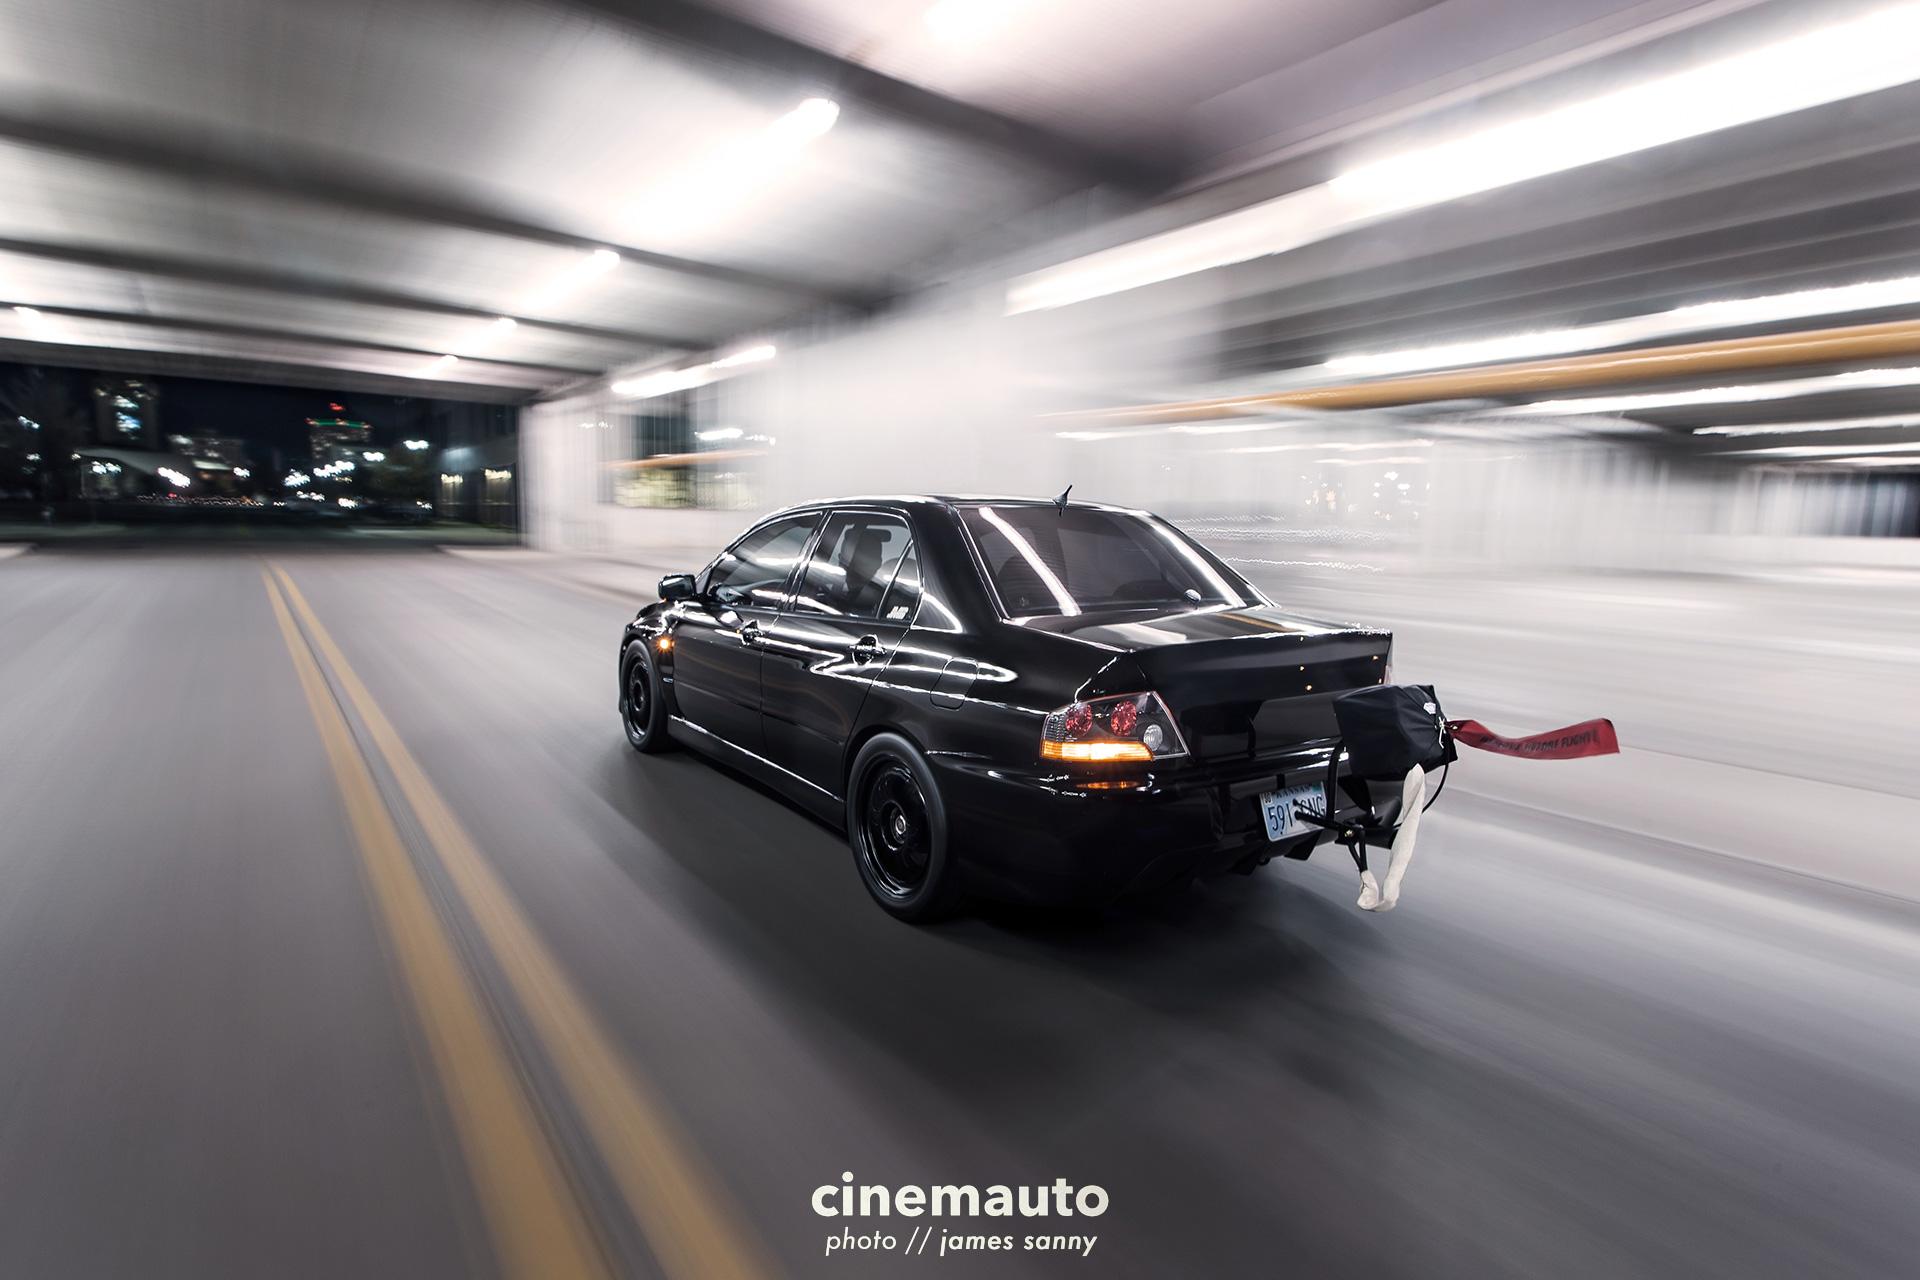 wichita-automotive-photographer-cinemauto-james-sanny-tj14sm.jpg